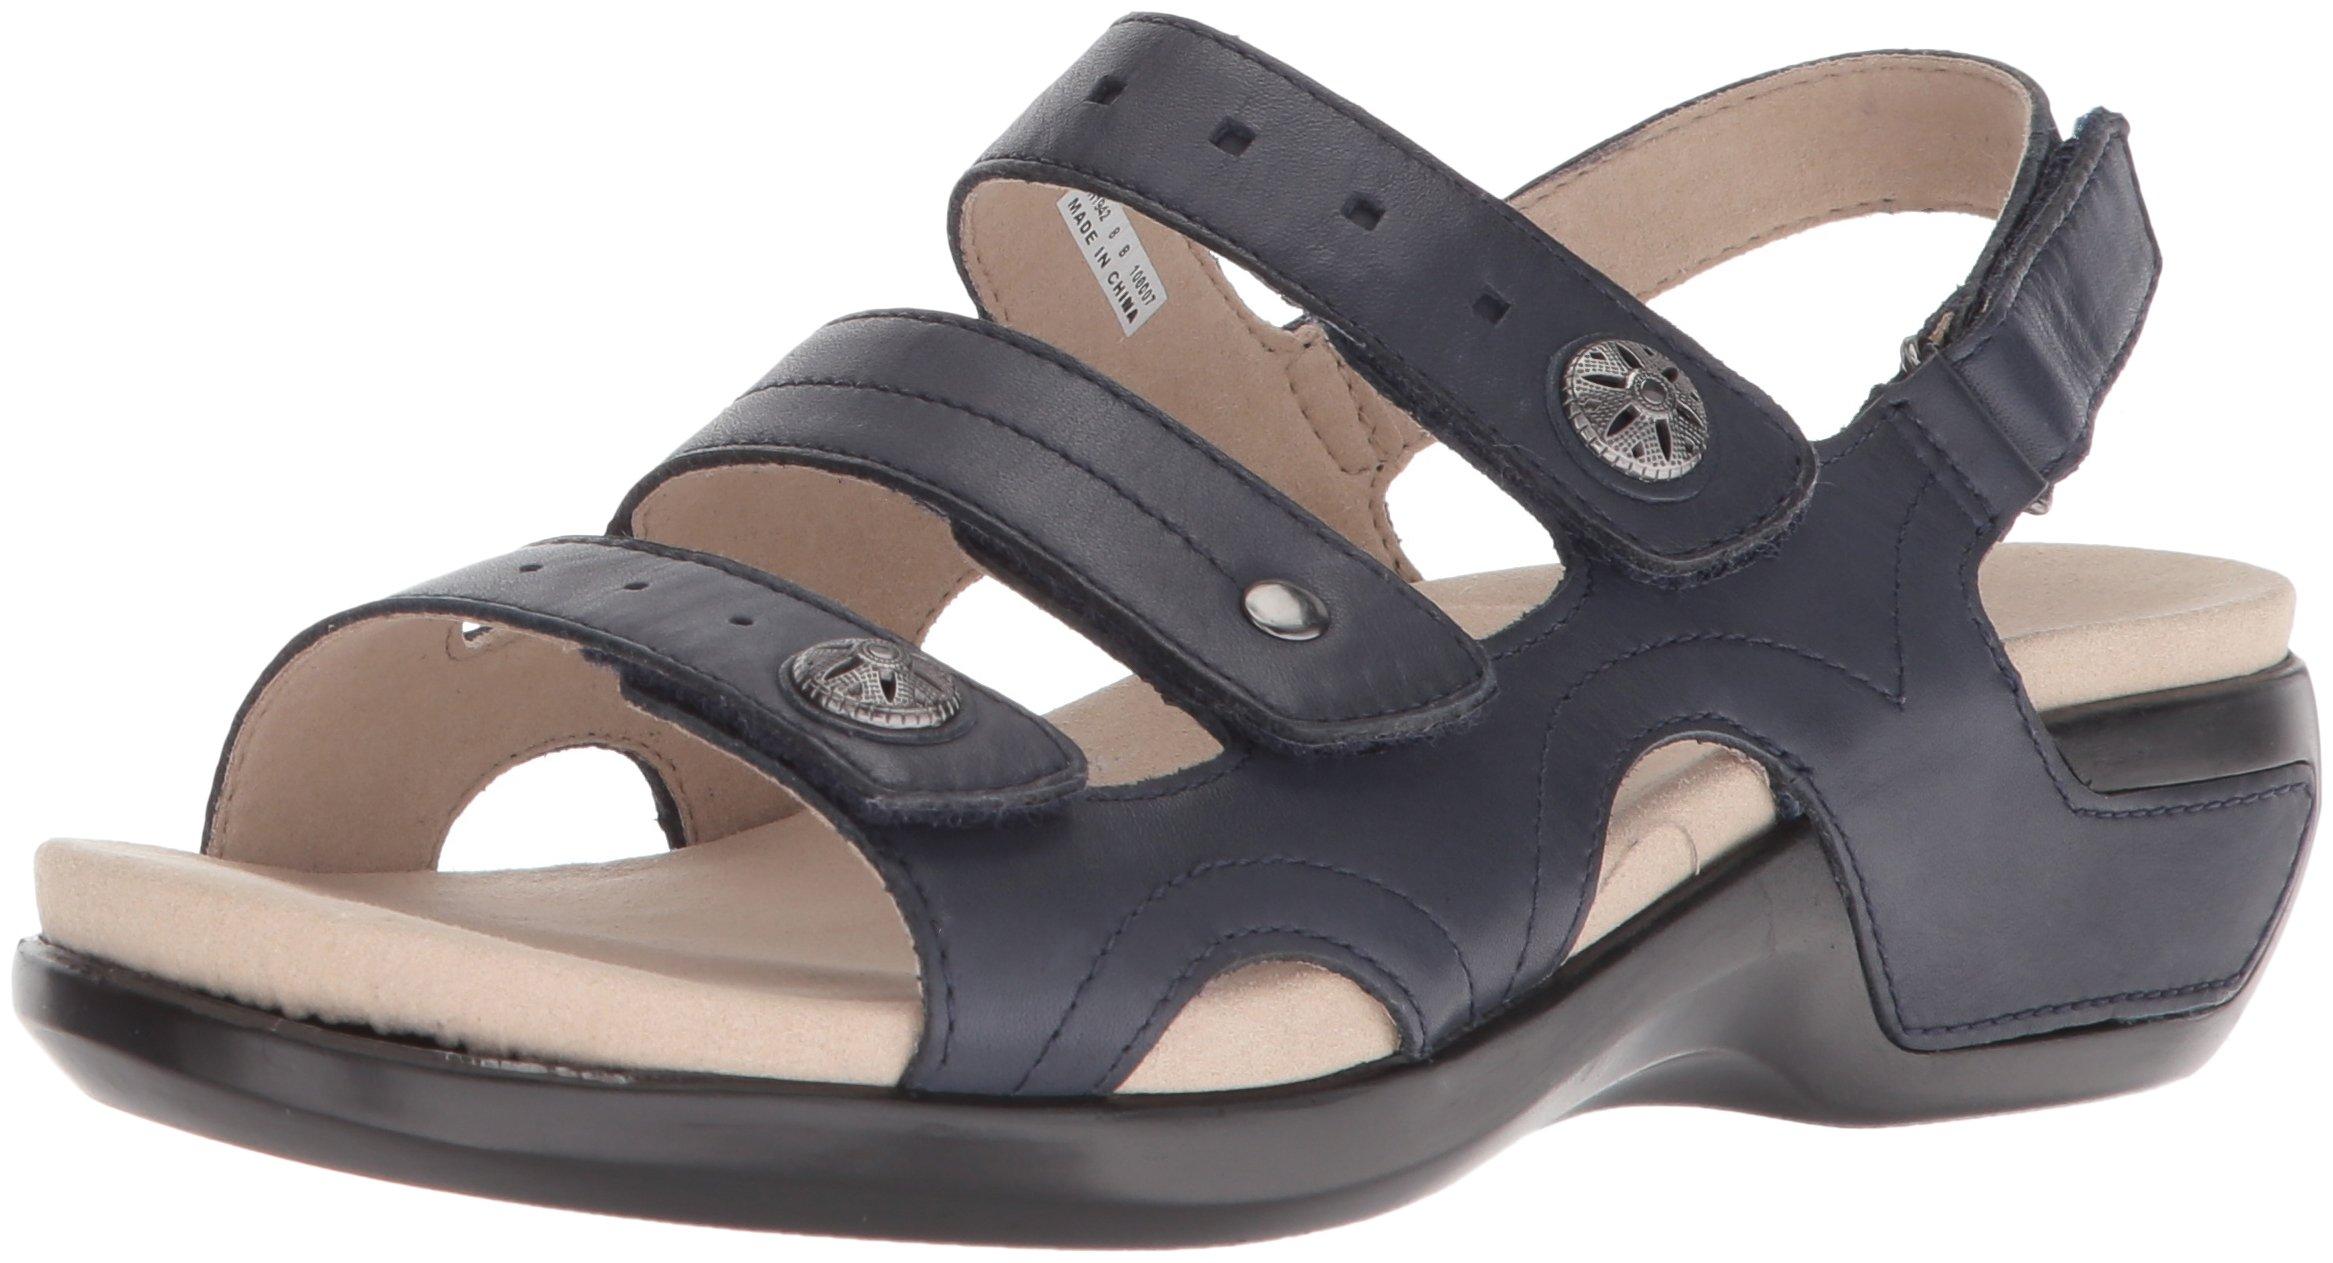 Aravon Women's Pc Three Strap Sandal, Navy Leather, 13 2E US by Aravon